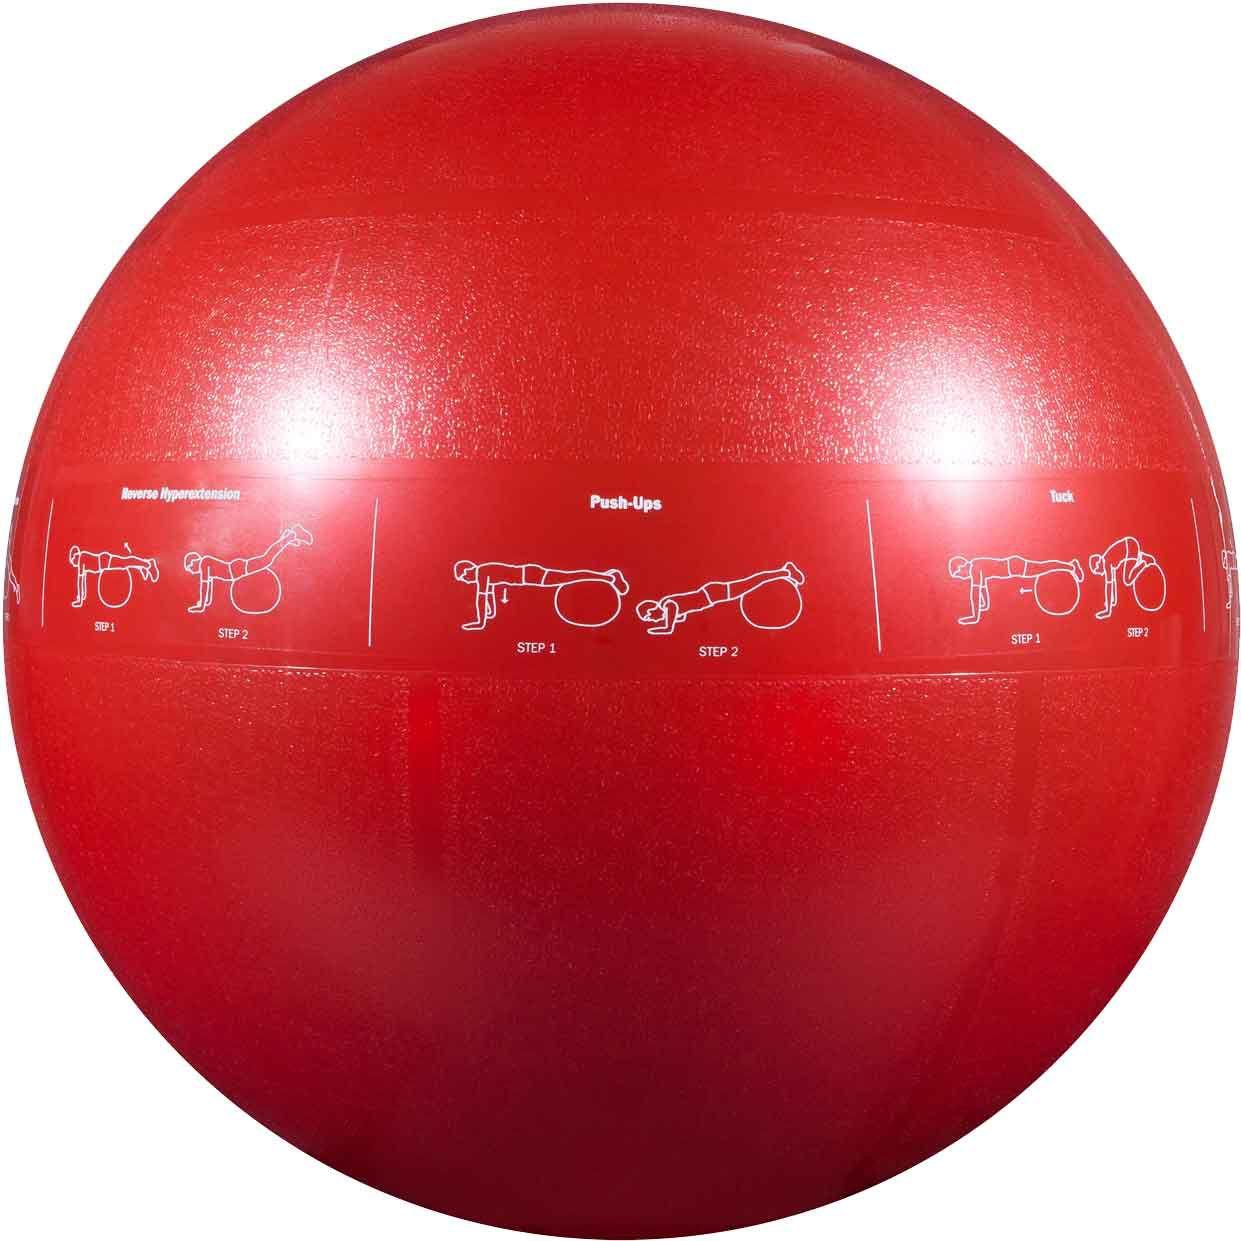 Ball Balance Season Java Game: GoFit Pro 65 Cm Stability Ball